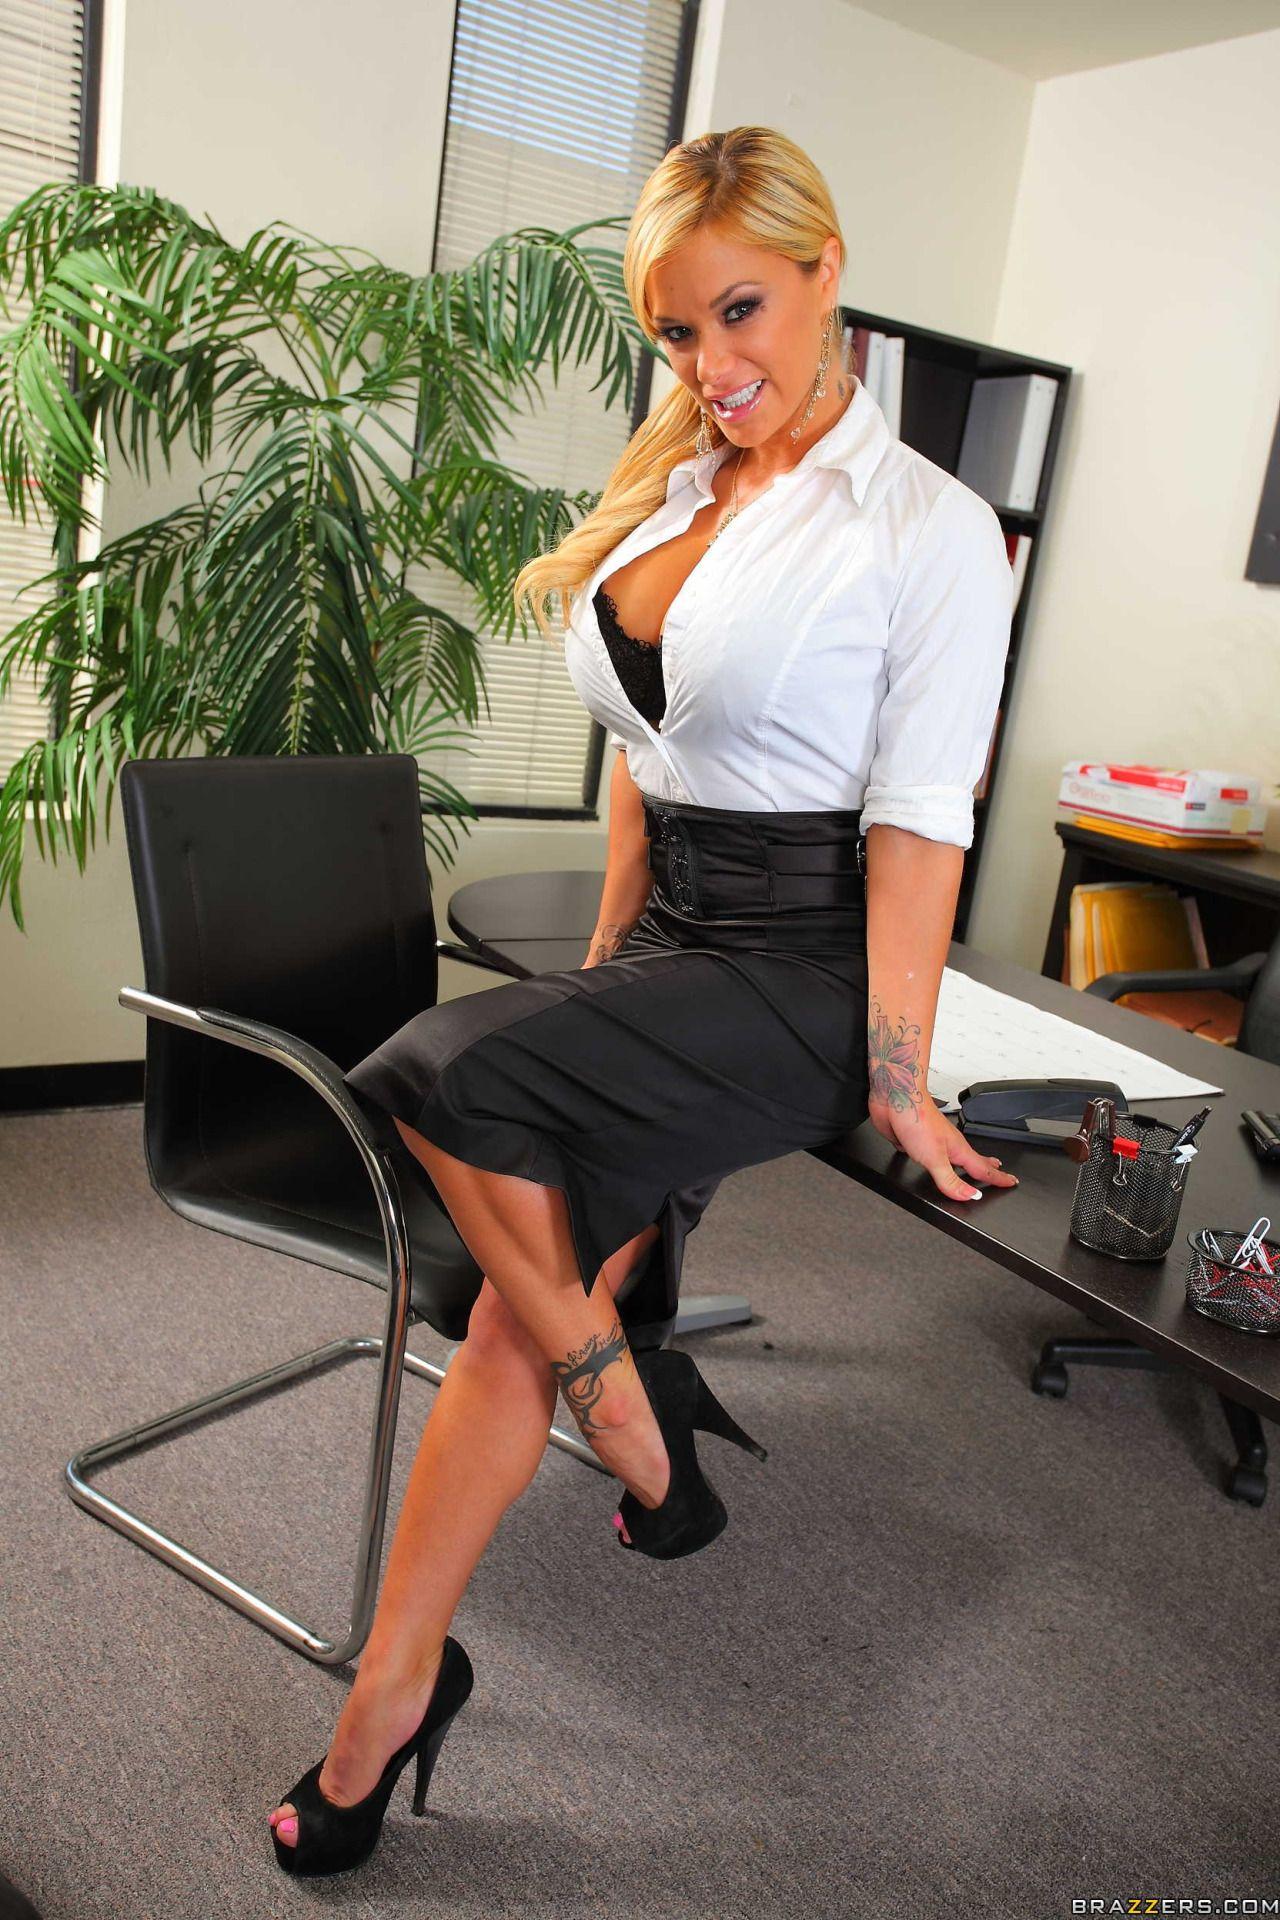 Hot Pornstar Secretary Lucy Zara Lounges On Her Desk Spread In Stockings